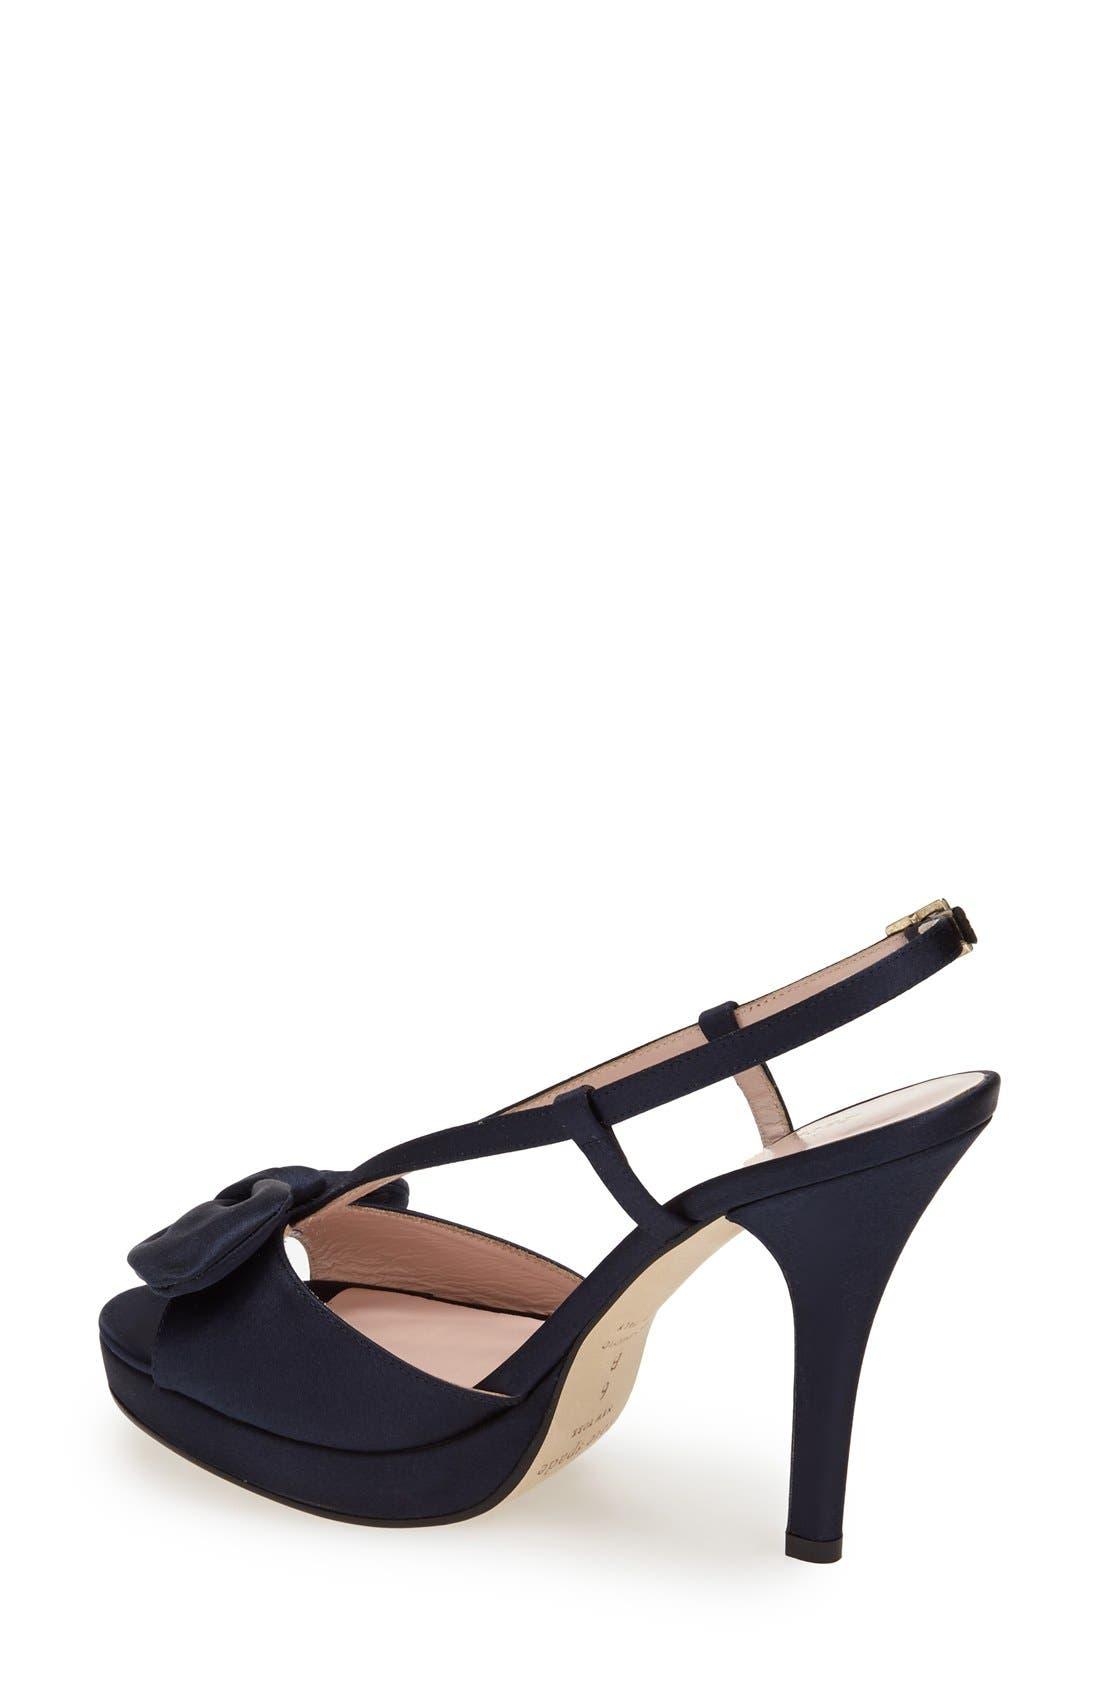 Alternate Image 2  - kate spade new york 'rezza' platform sandal (Women)